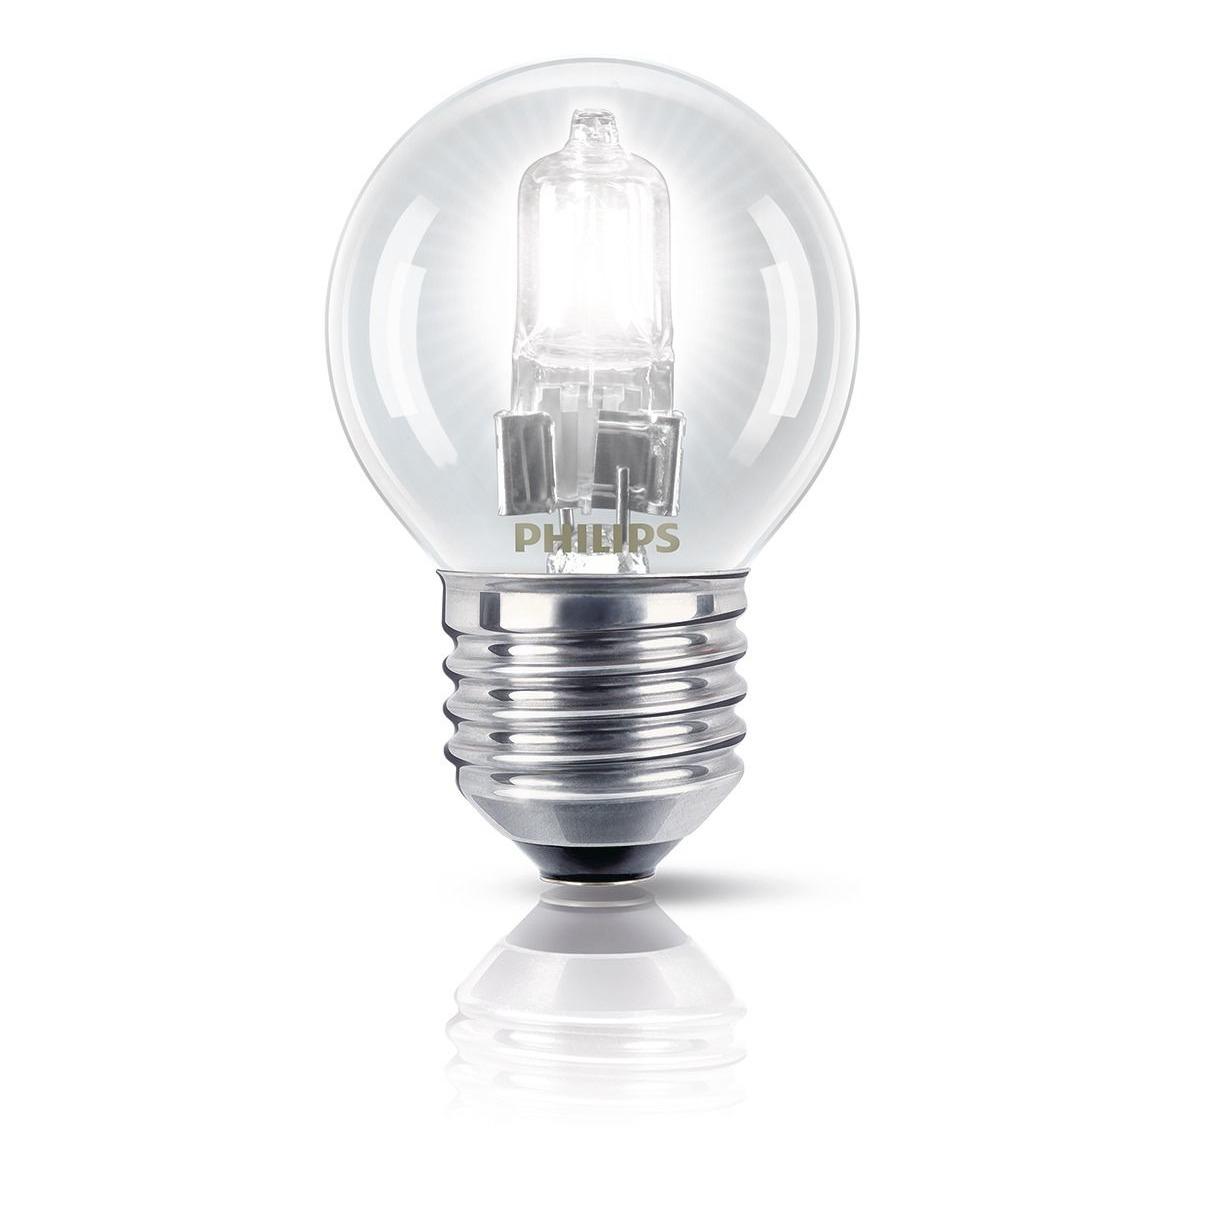 Philips halogeenlamp E27 42W 630Lm kogel